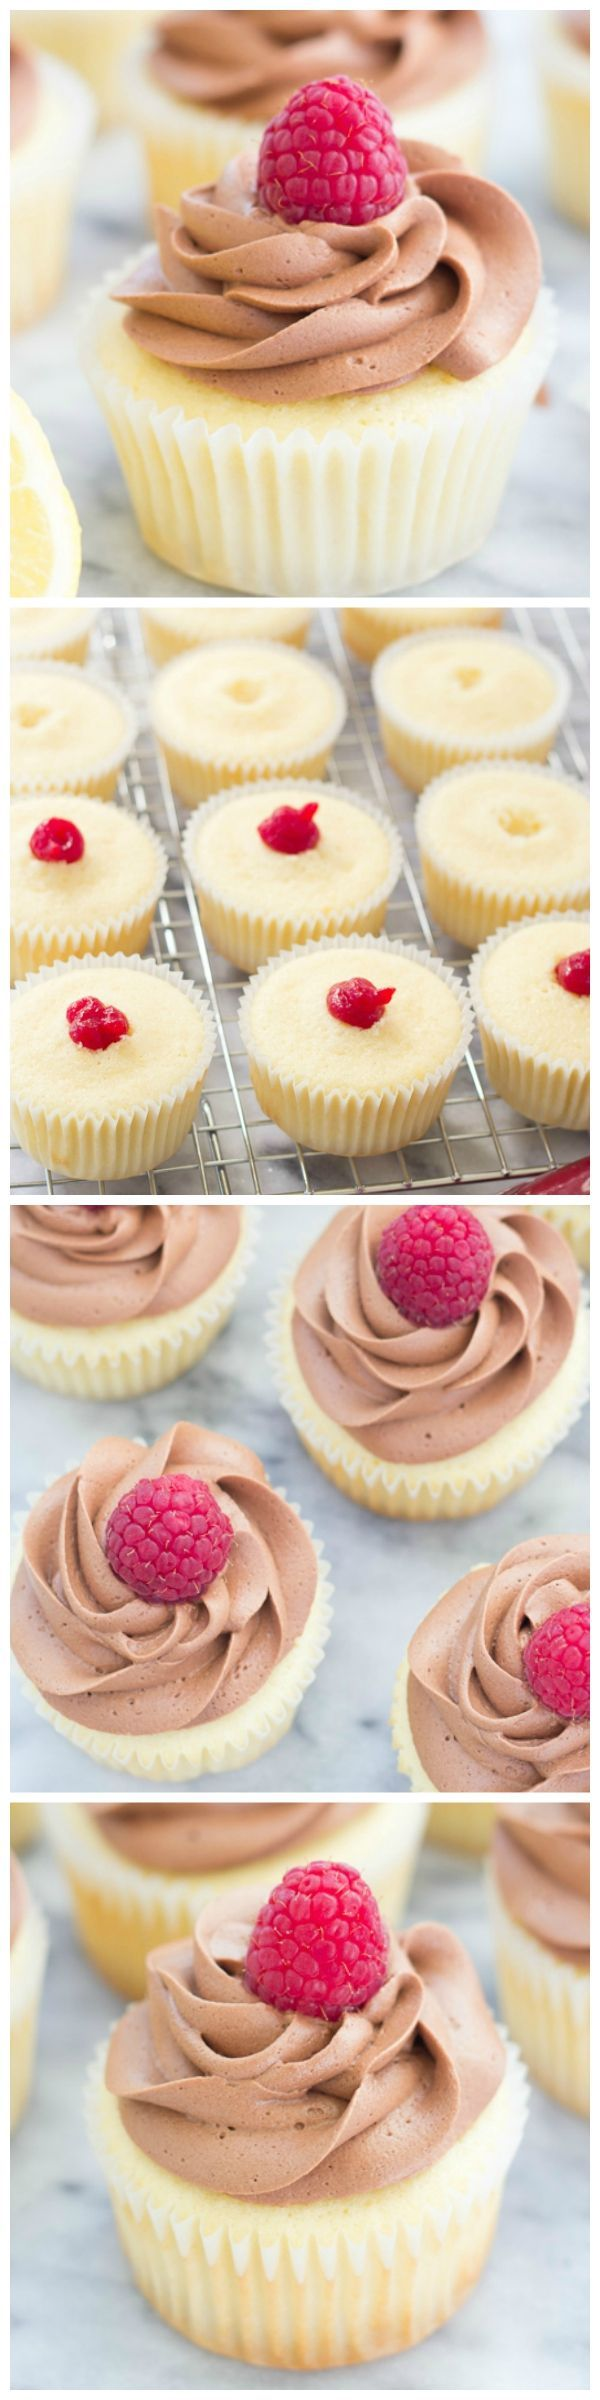 Raspberry-Filled Chocolate Lemon Cupcakes with fudgy Greek yogurt frosting!